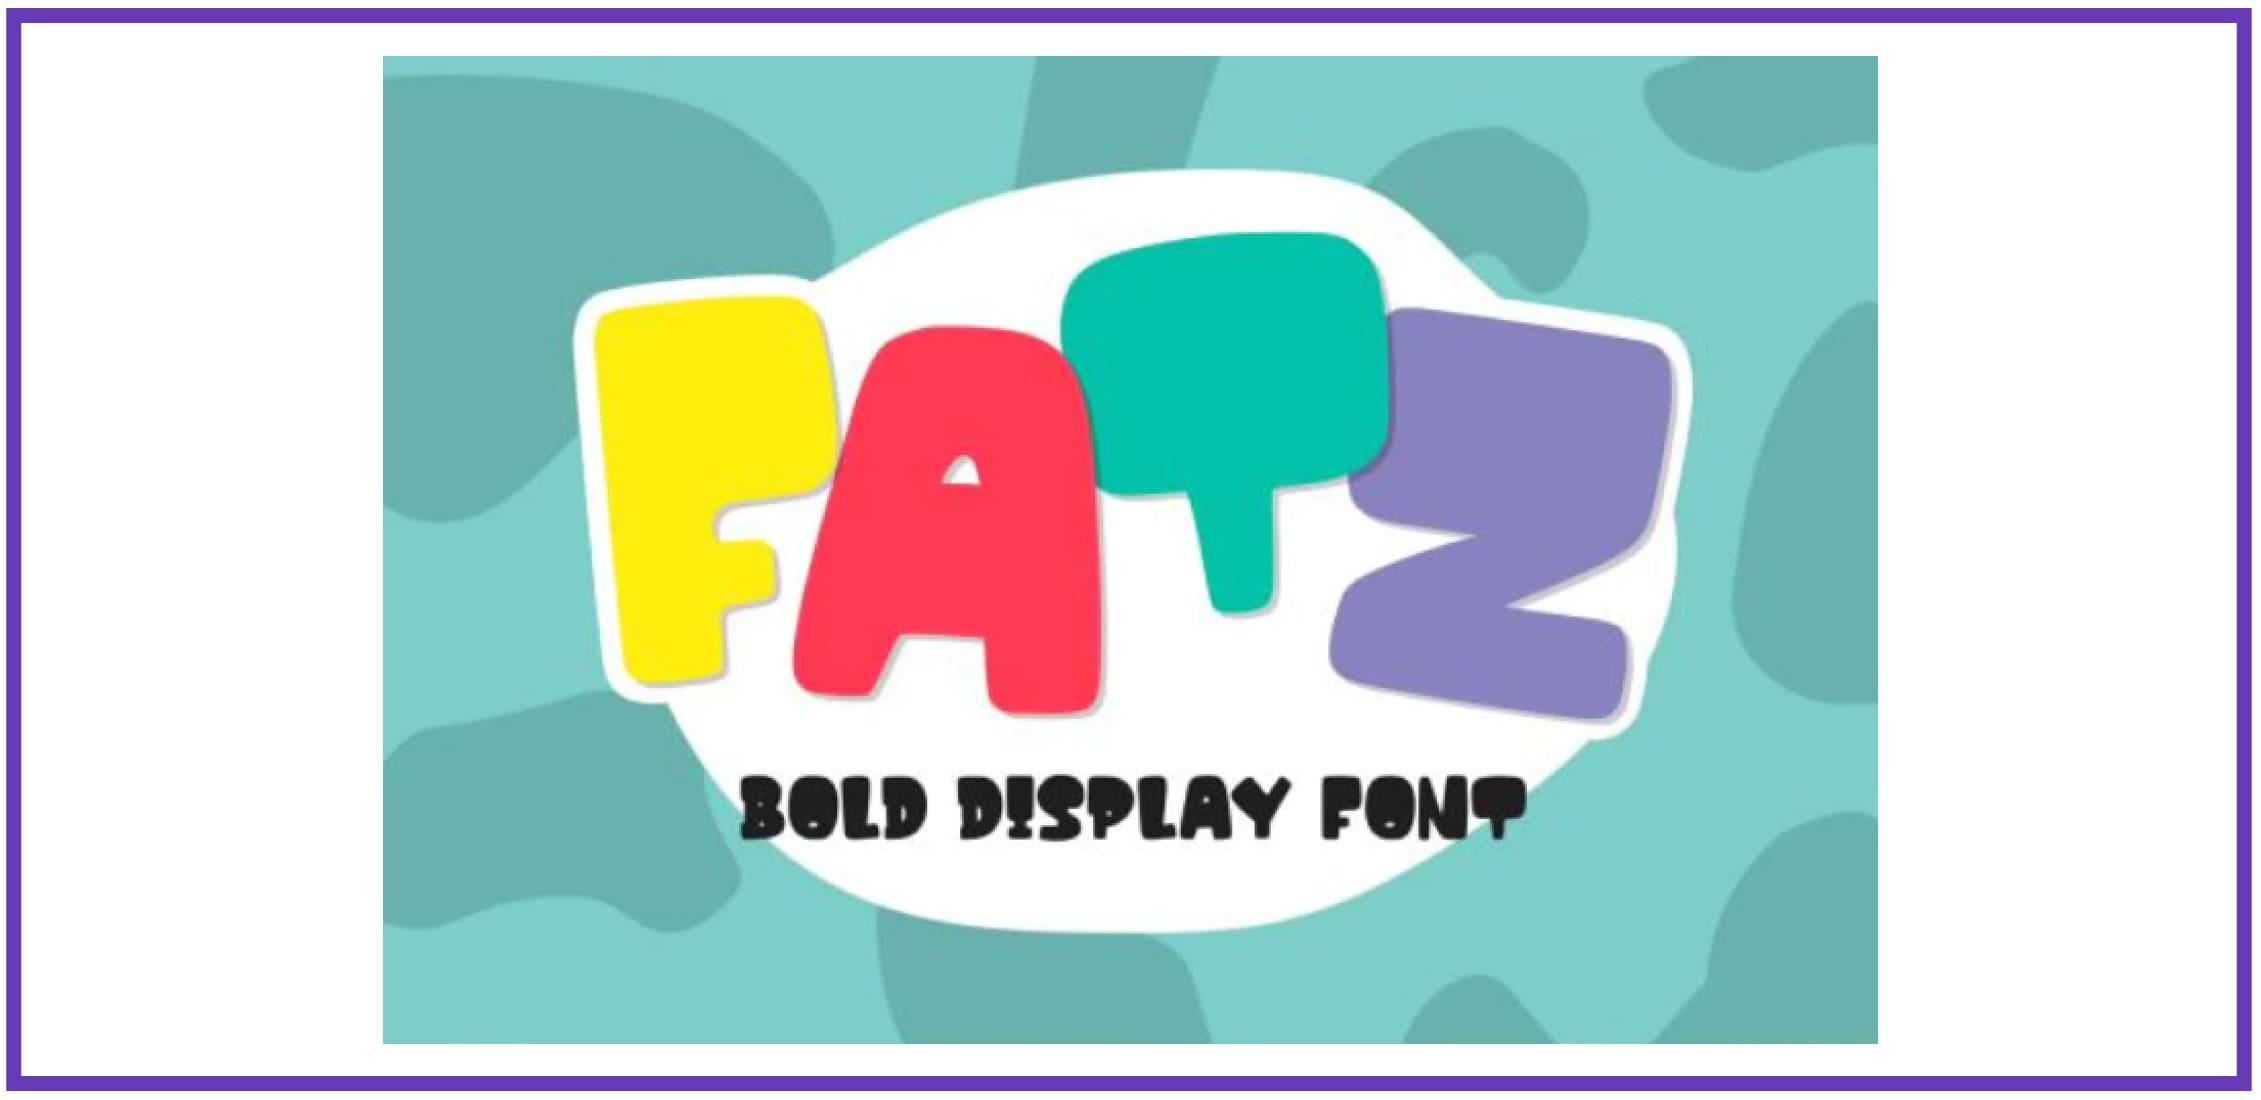 Fatz. Best Beachy Fonts.